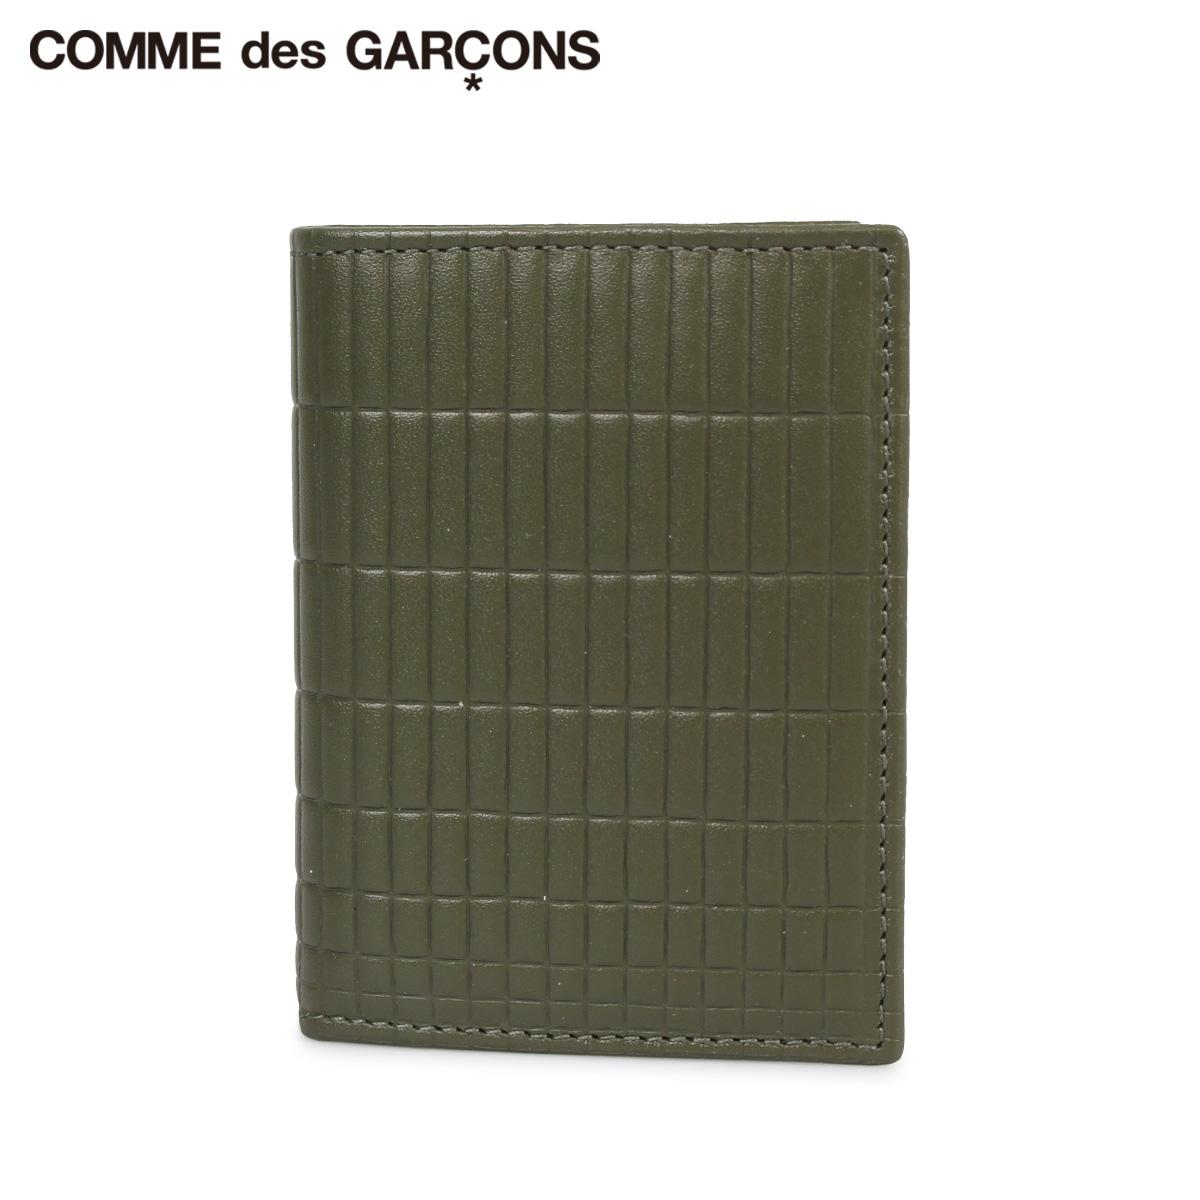 COMME des GARCONS コムデギャルソン 財布 二つ折り メンズ レディース BRICK LINE WALLET カーキ SA0641BK